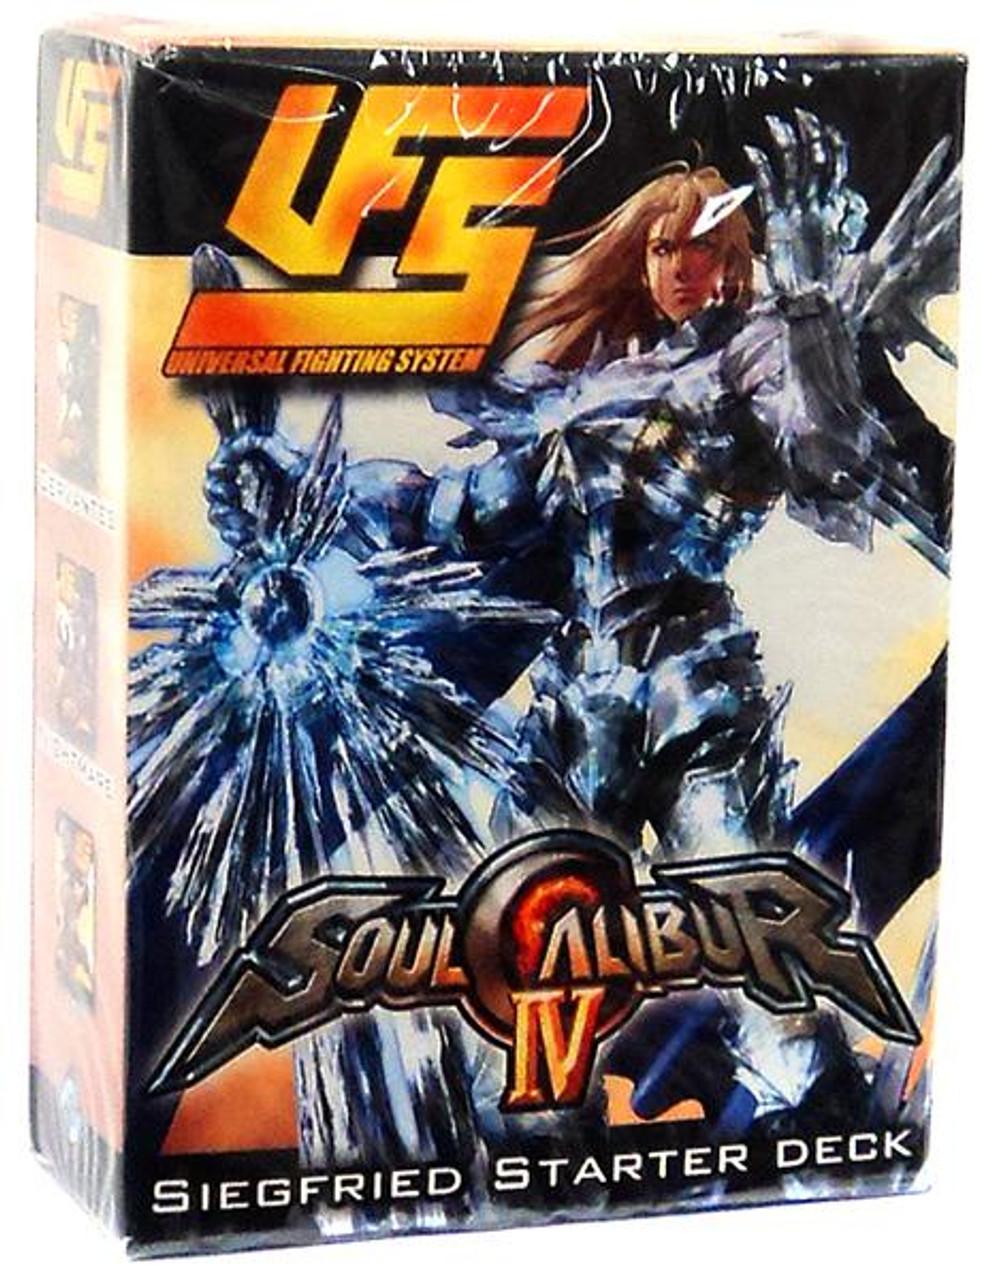 Universal Fighting System Soul Calibur IV Siegfried Starter Deck